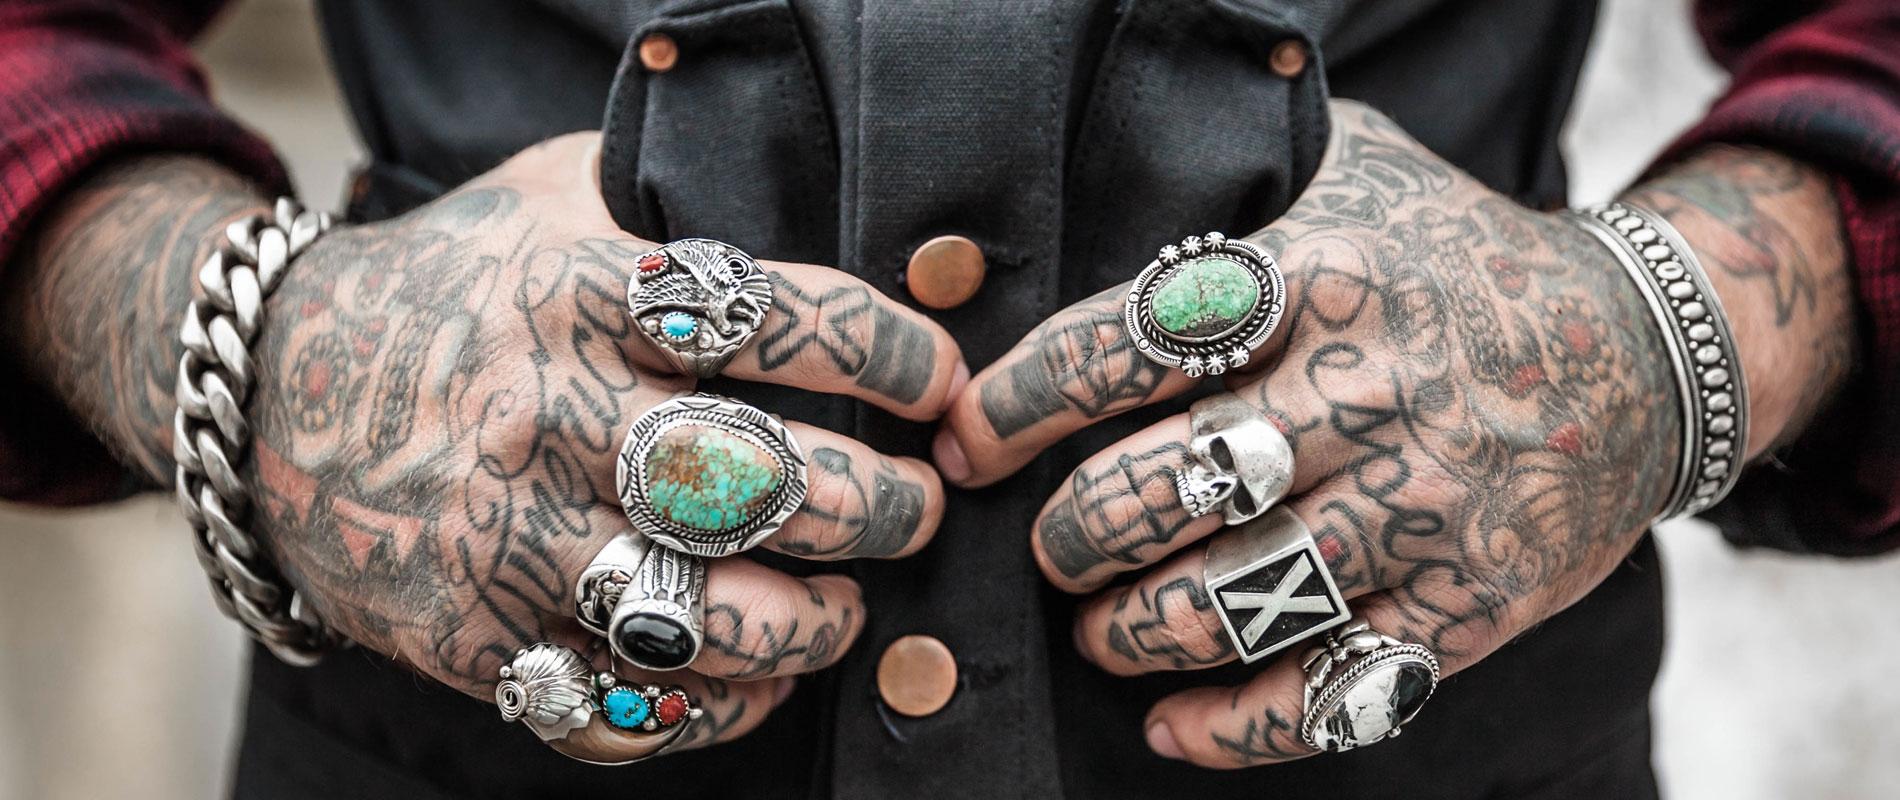 Willkommen Tattoo-Freunde